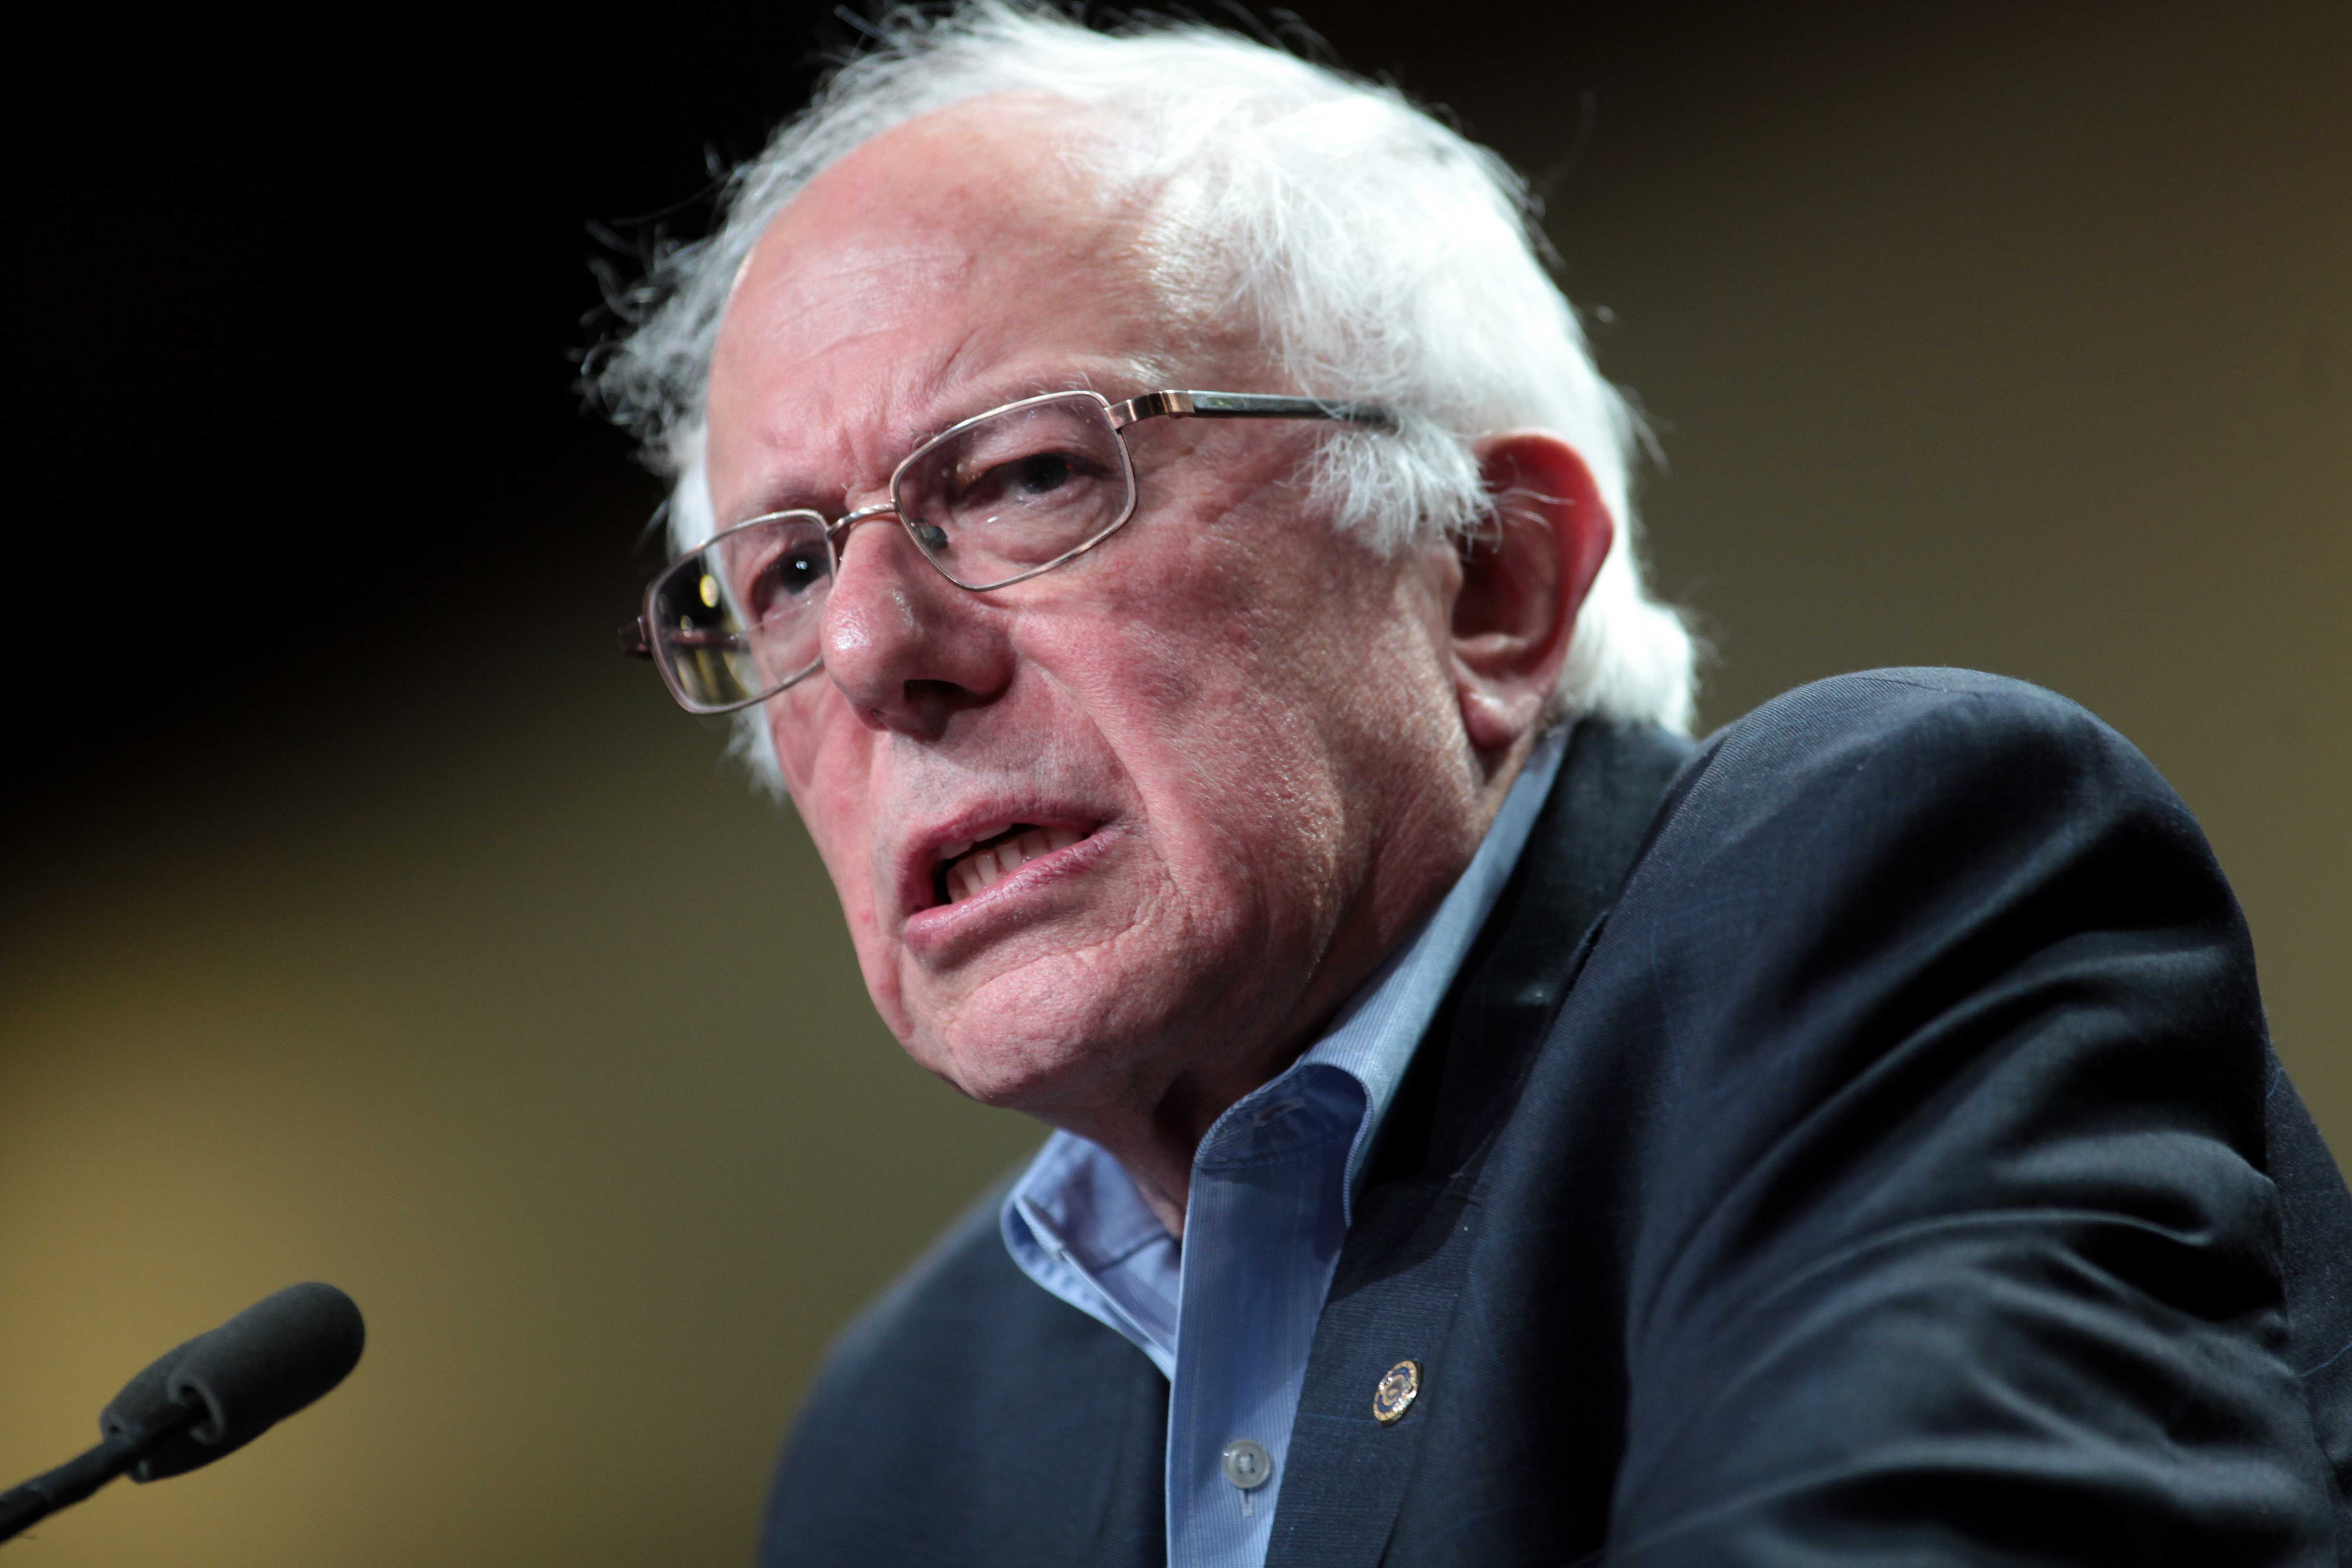 Bernie Sanders' hair through history